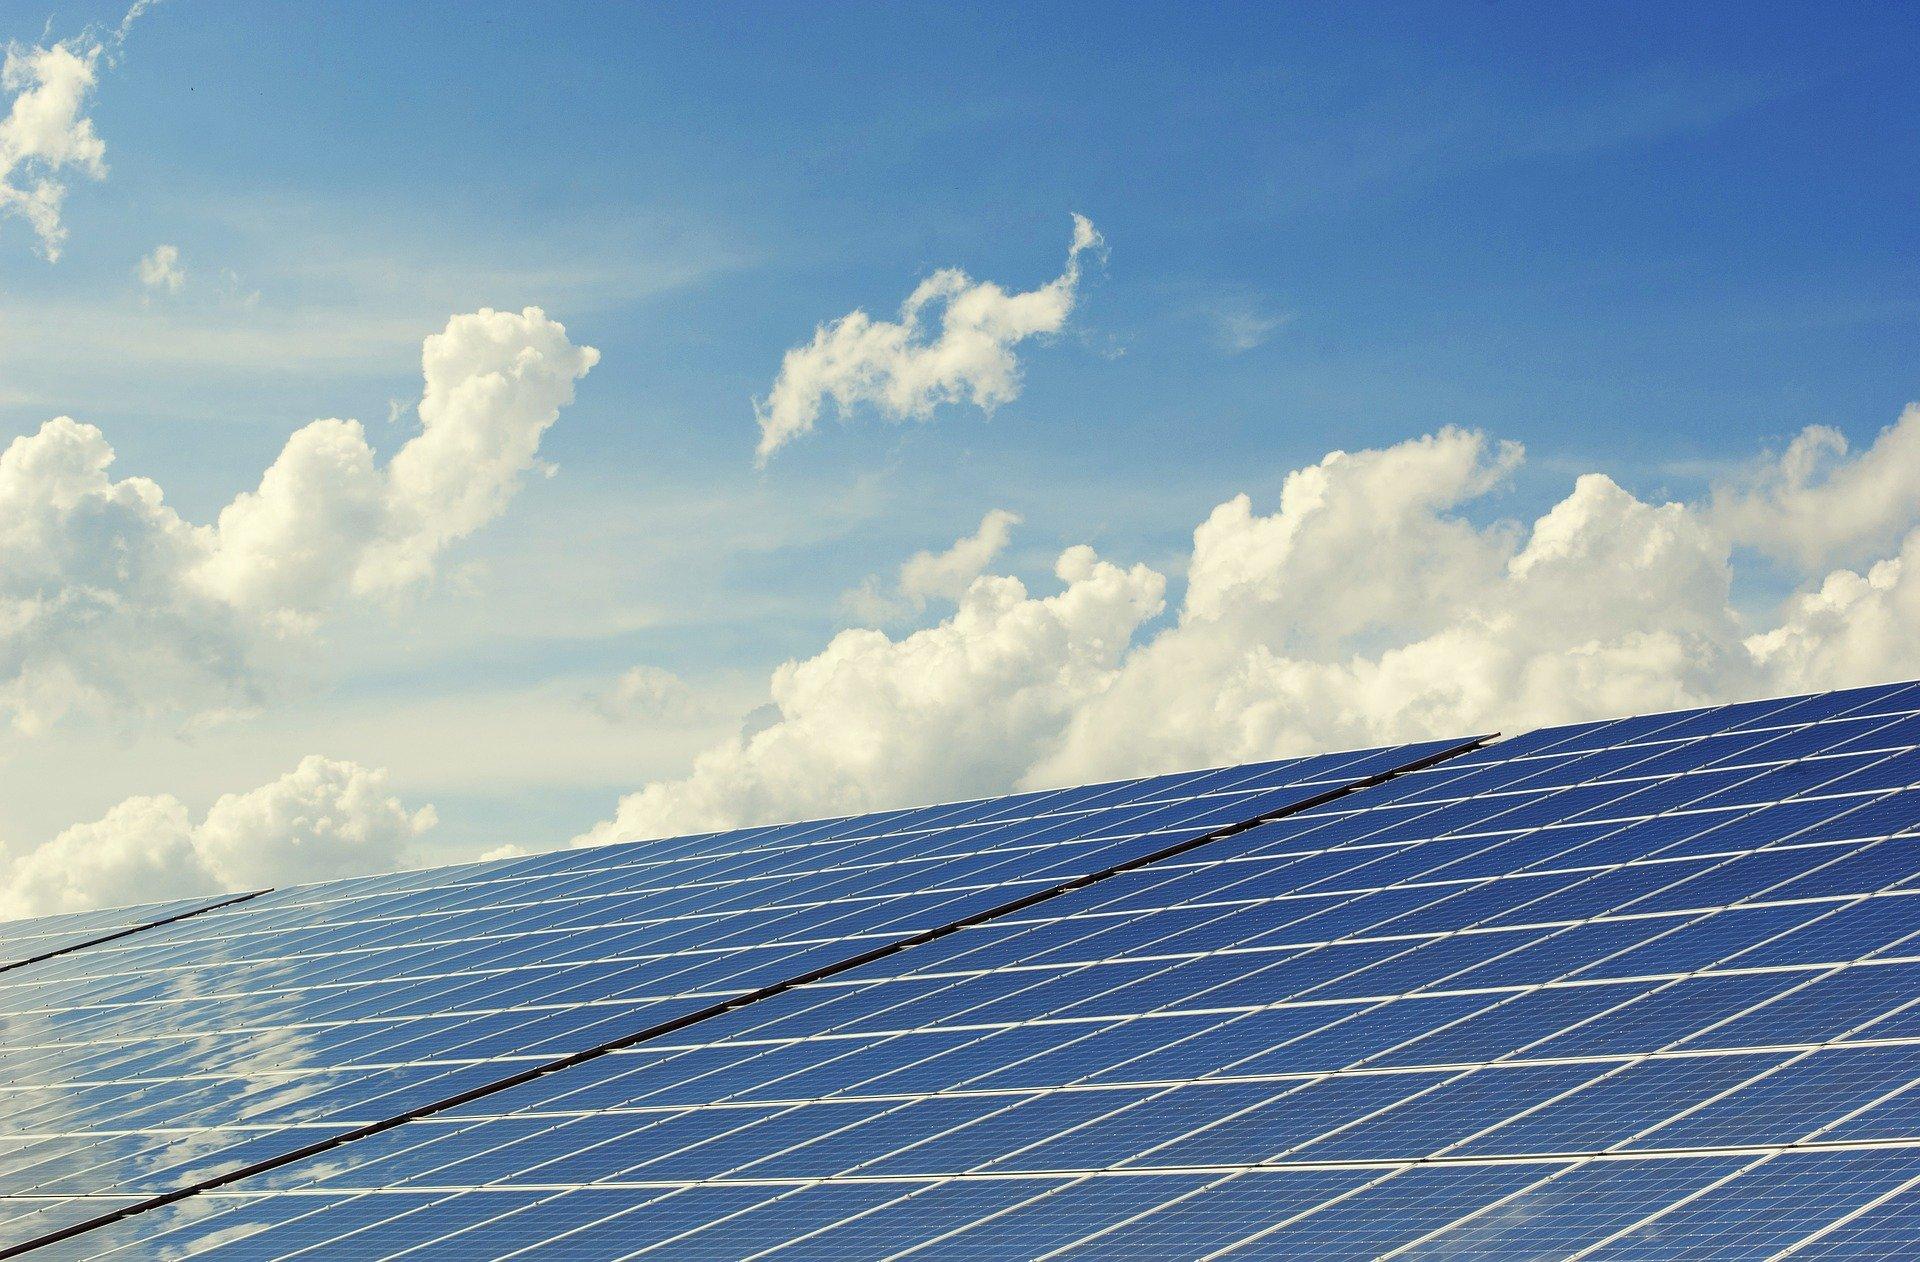 2021 Solar Industry Trends